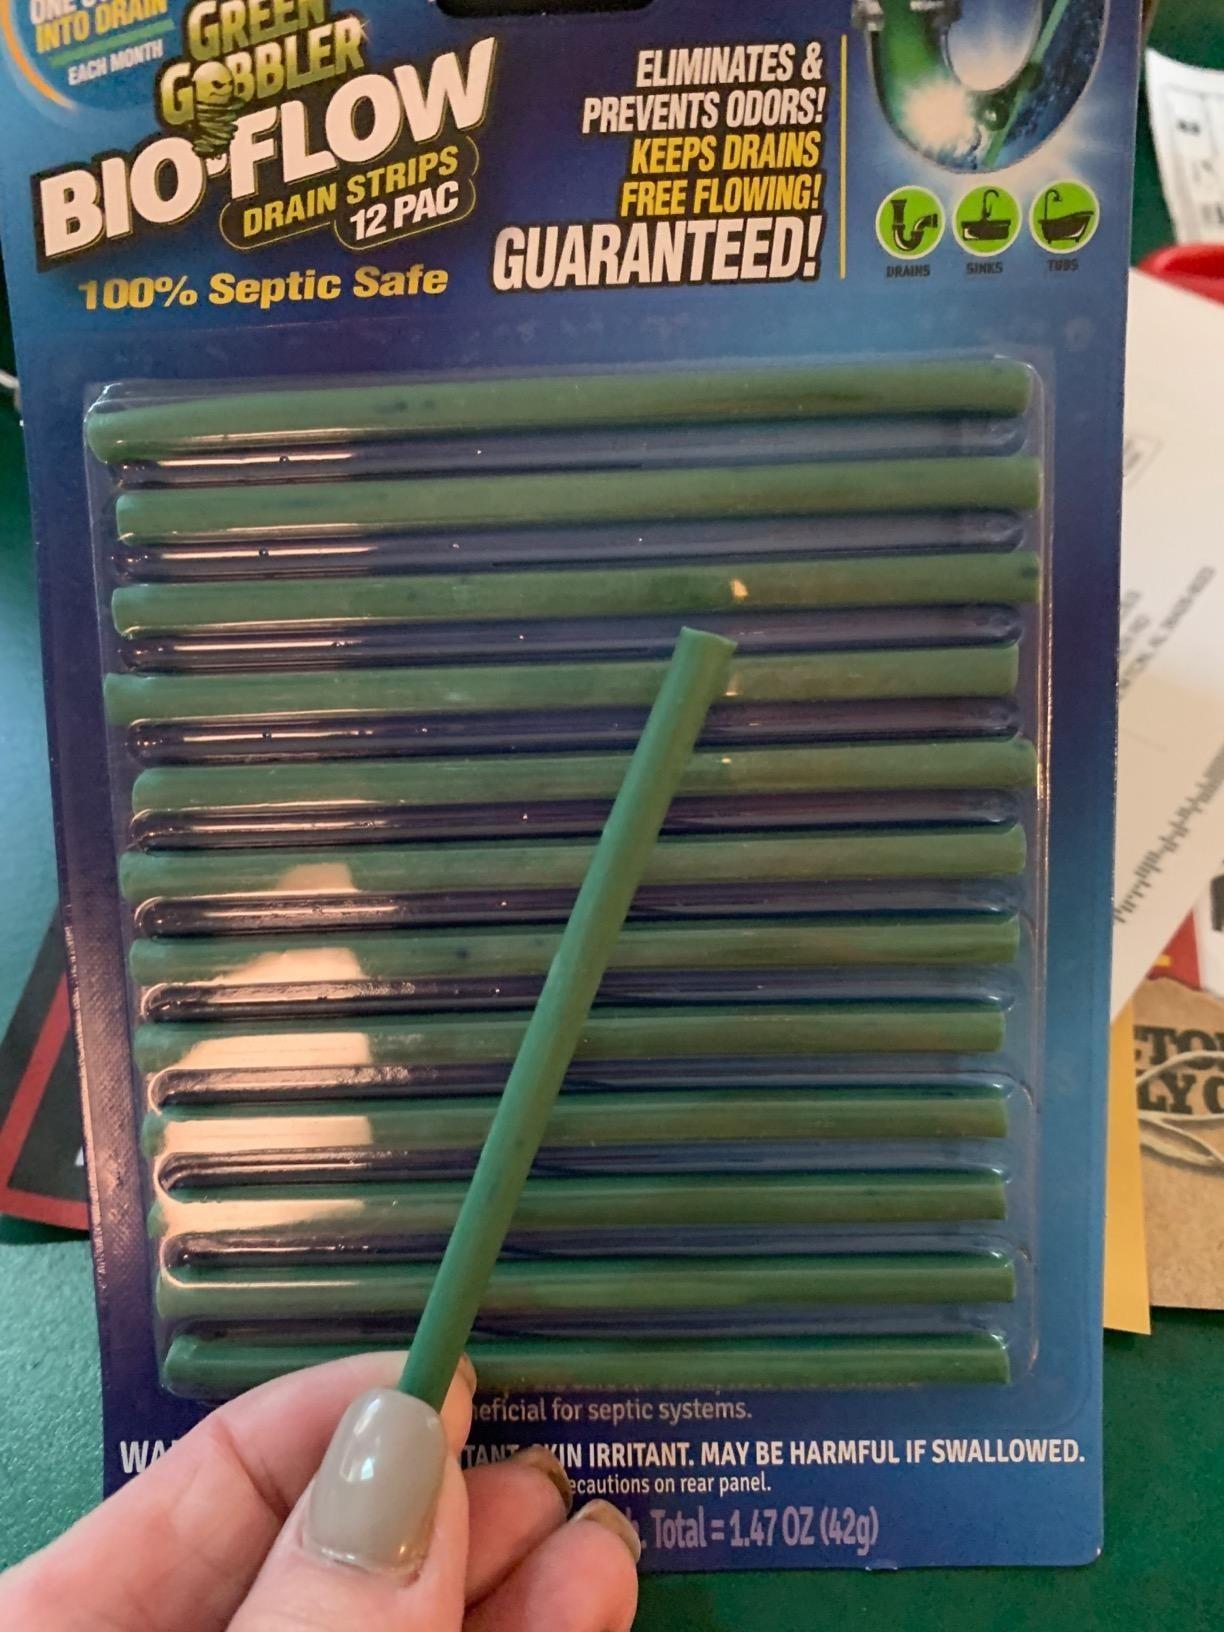 hand holds green drain deodorizer strip